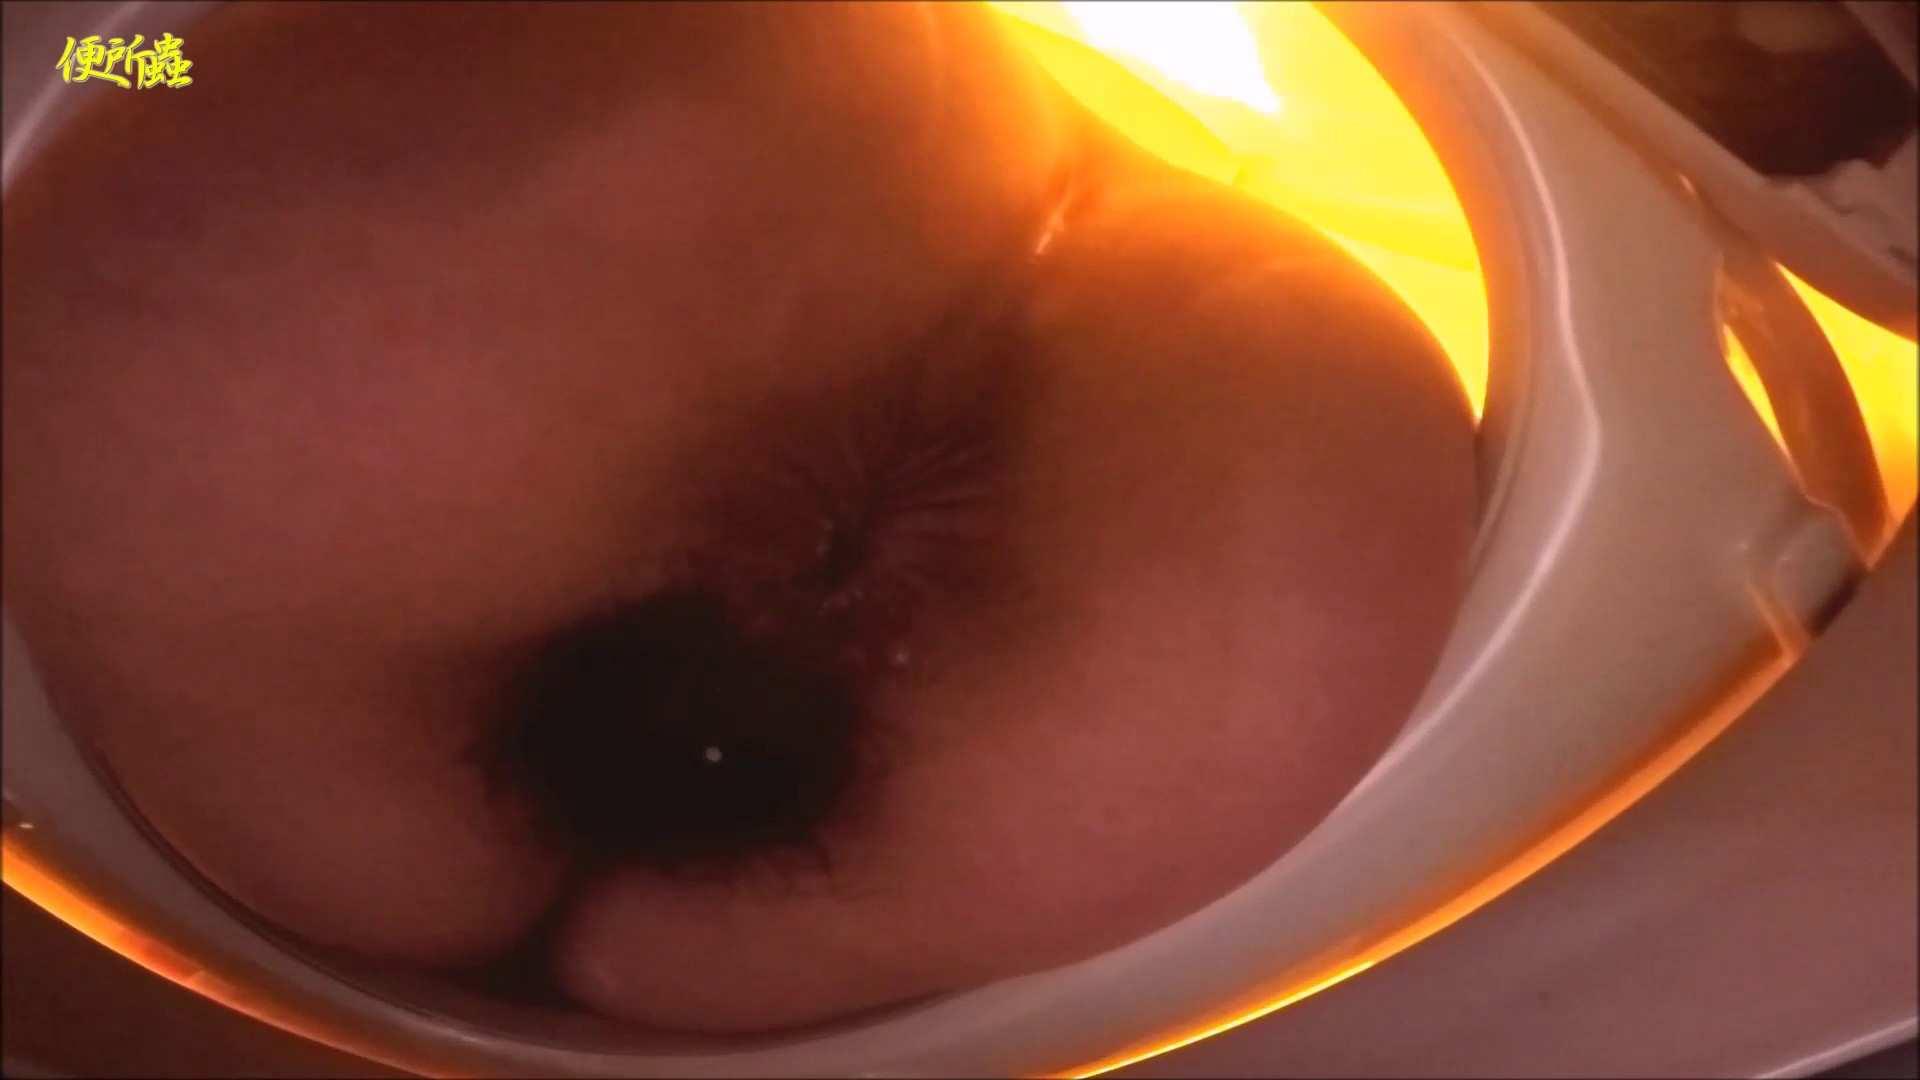 vol.08 便所蟲さんのリターン~寺子屋洗面所盗撮~ 丸見え エロ画像 94画像 18